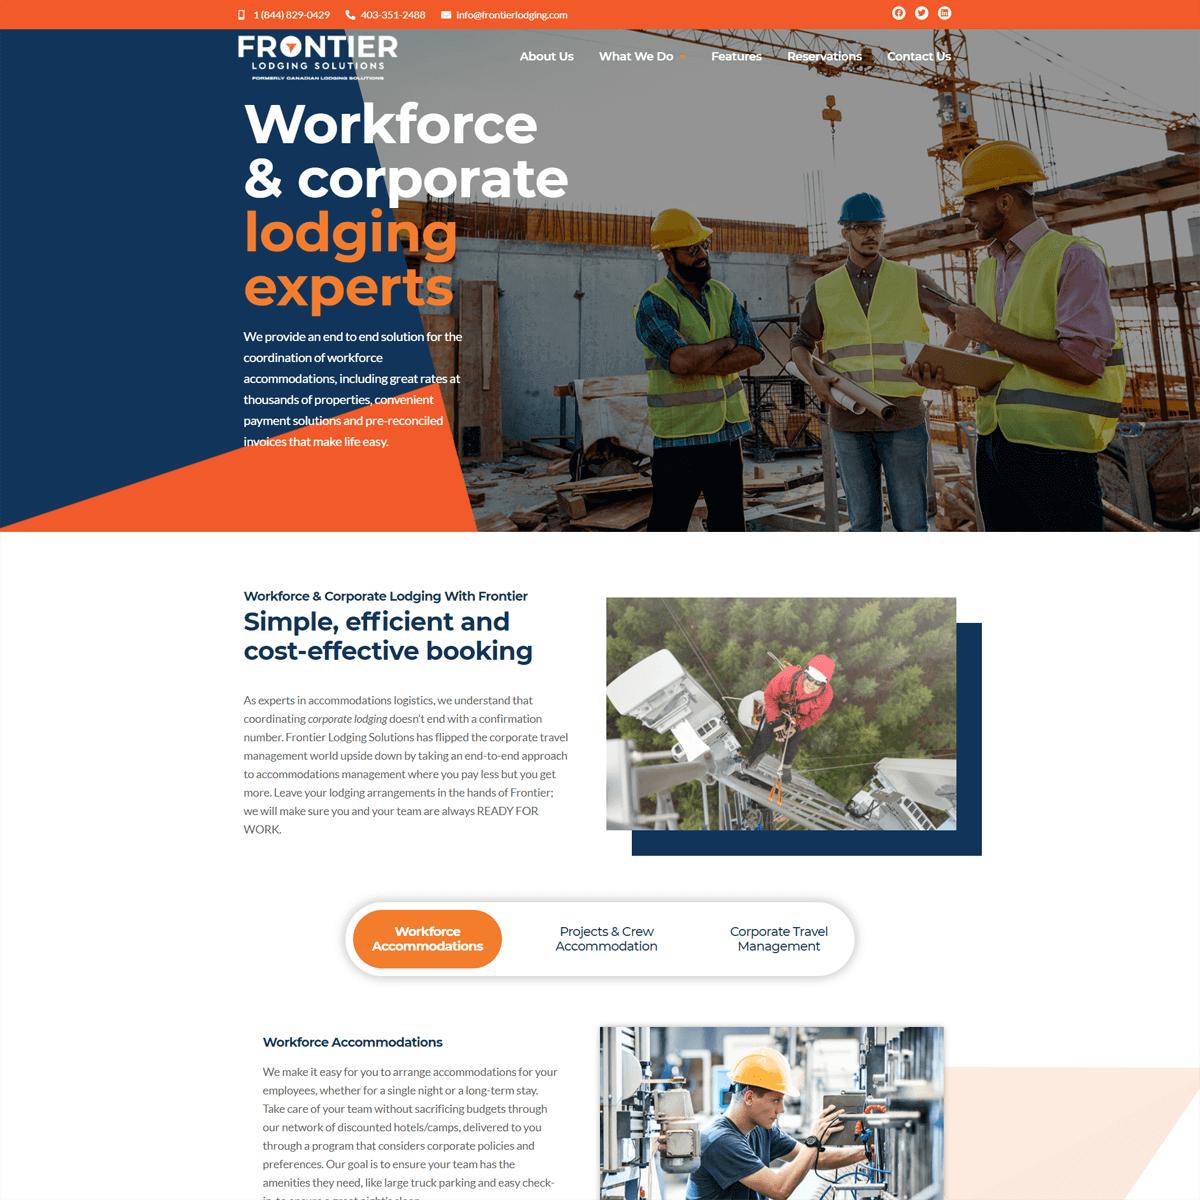 website-design-portfolio-after-frontier-lodging-solutions.jpg